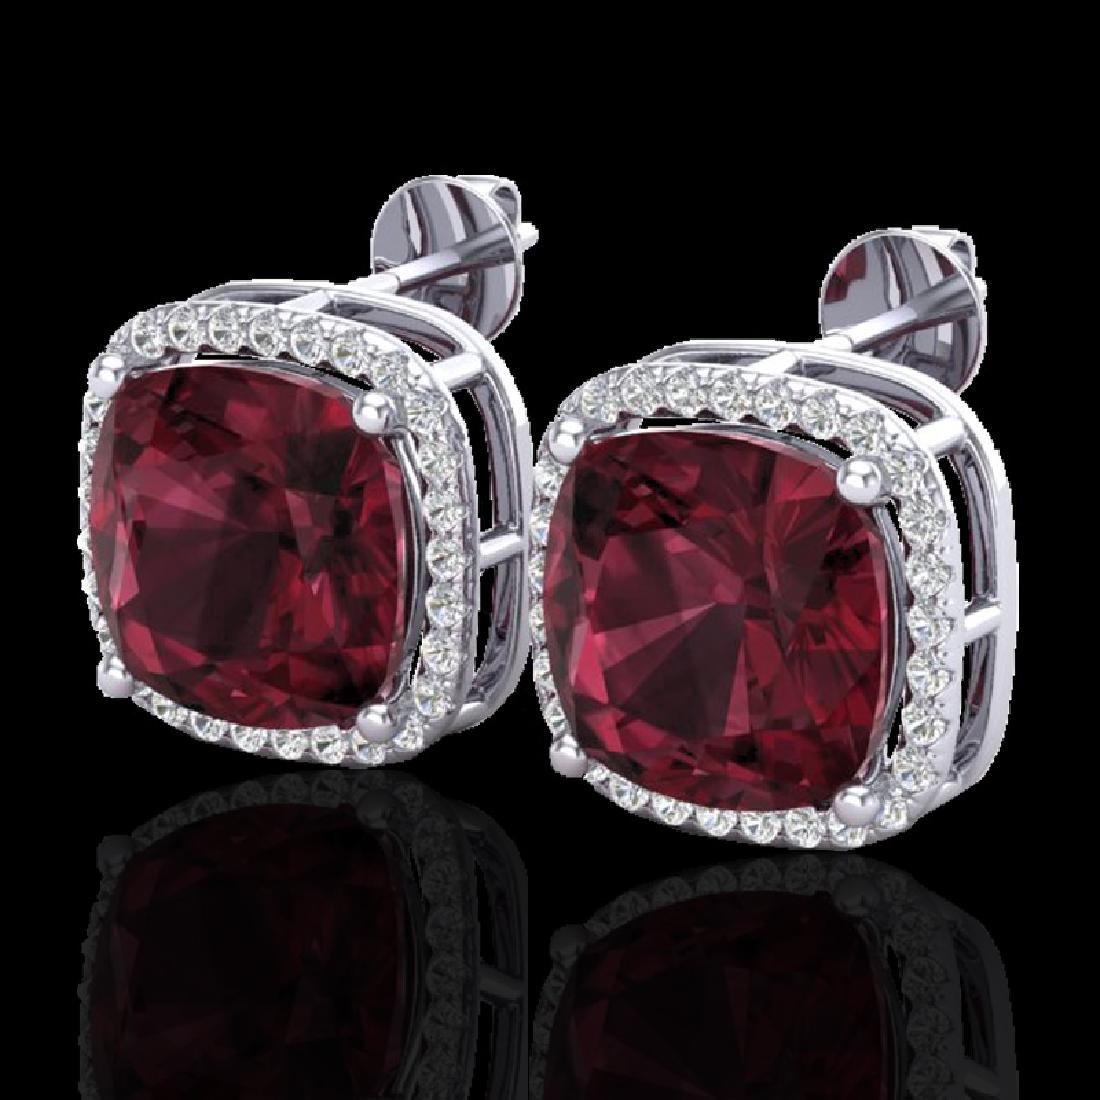 12 CTW Garnet & Micro Pave Halo VS/SI Diamond Earrings